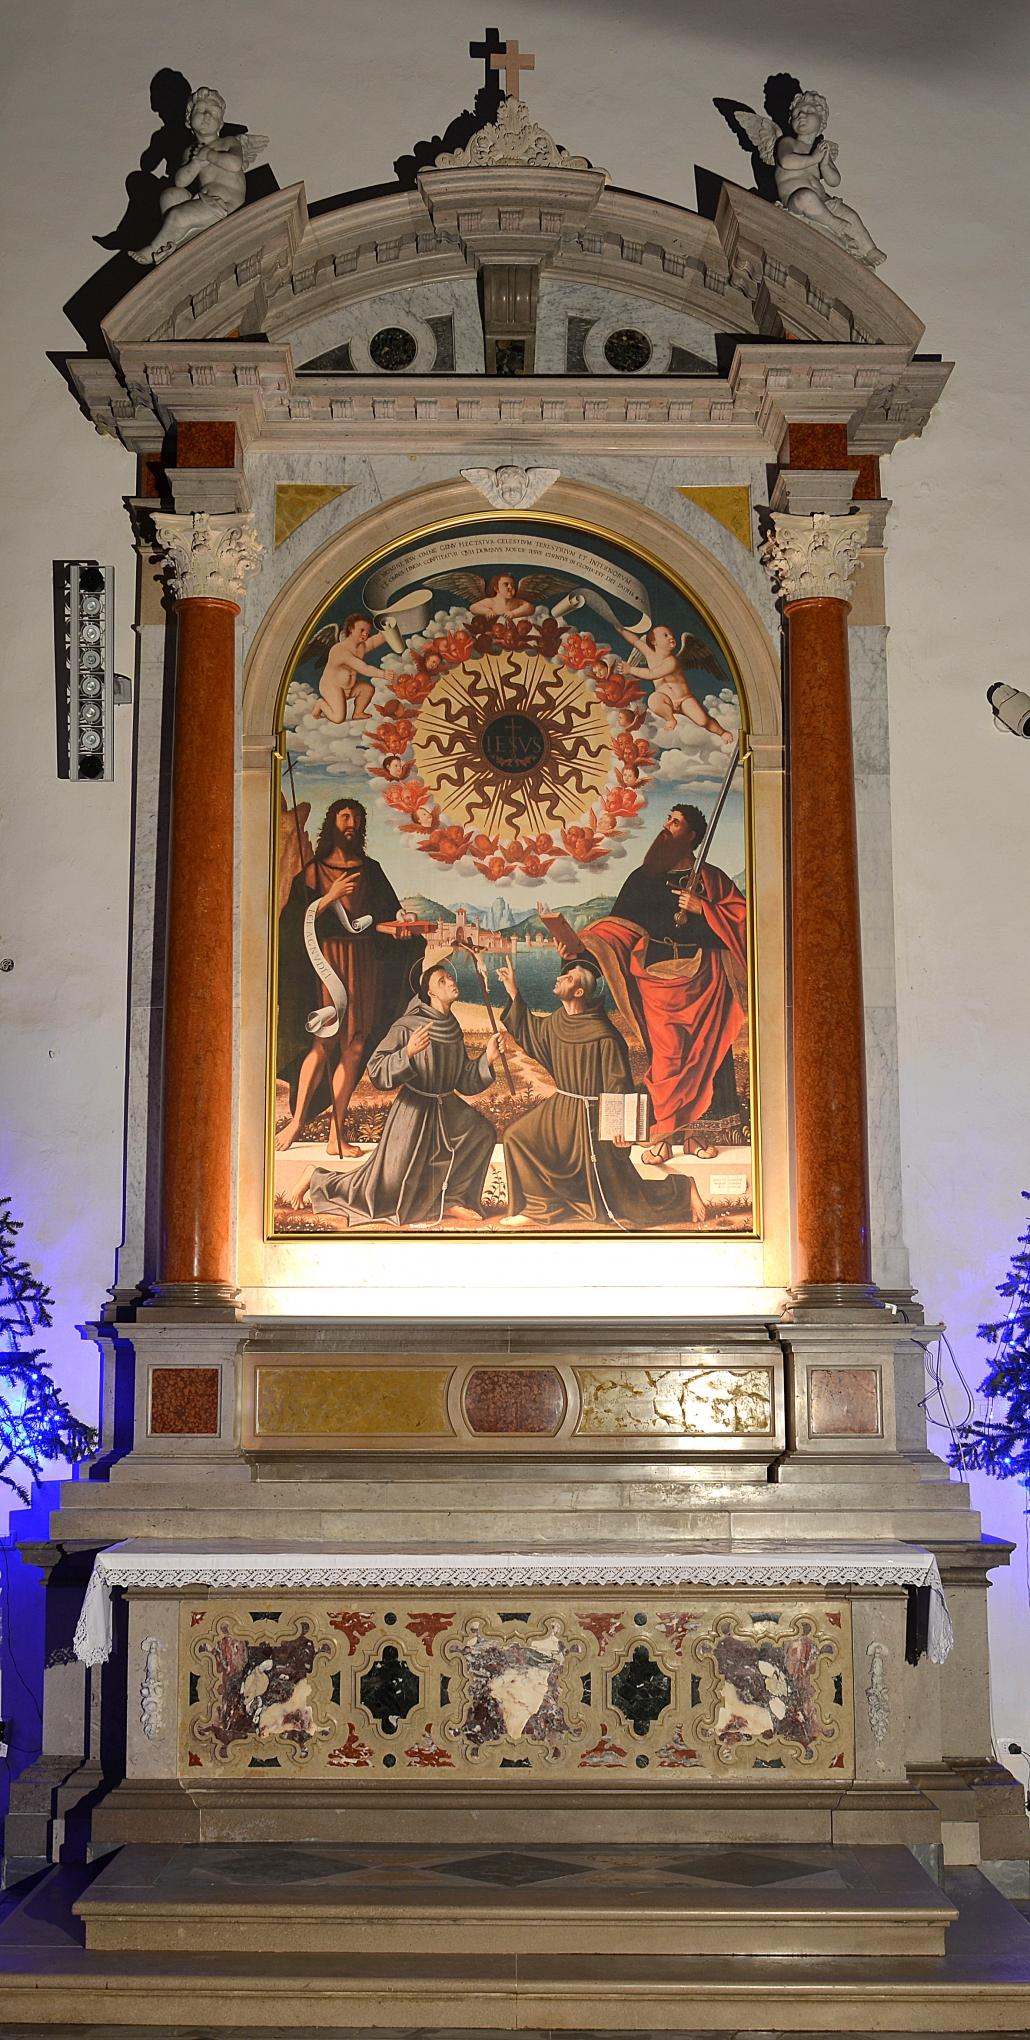 Frančiškanski samostan Koper - Restitucija